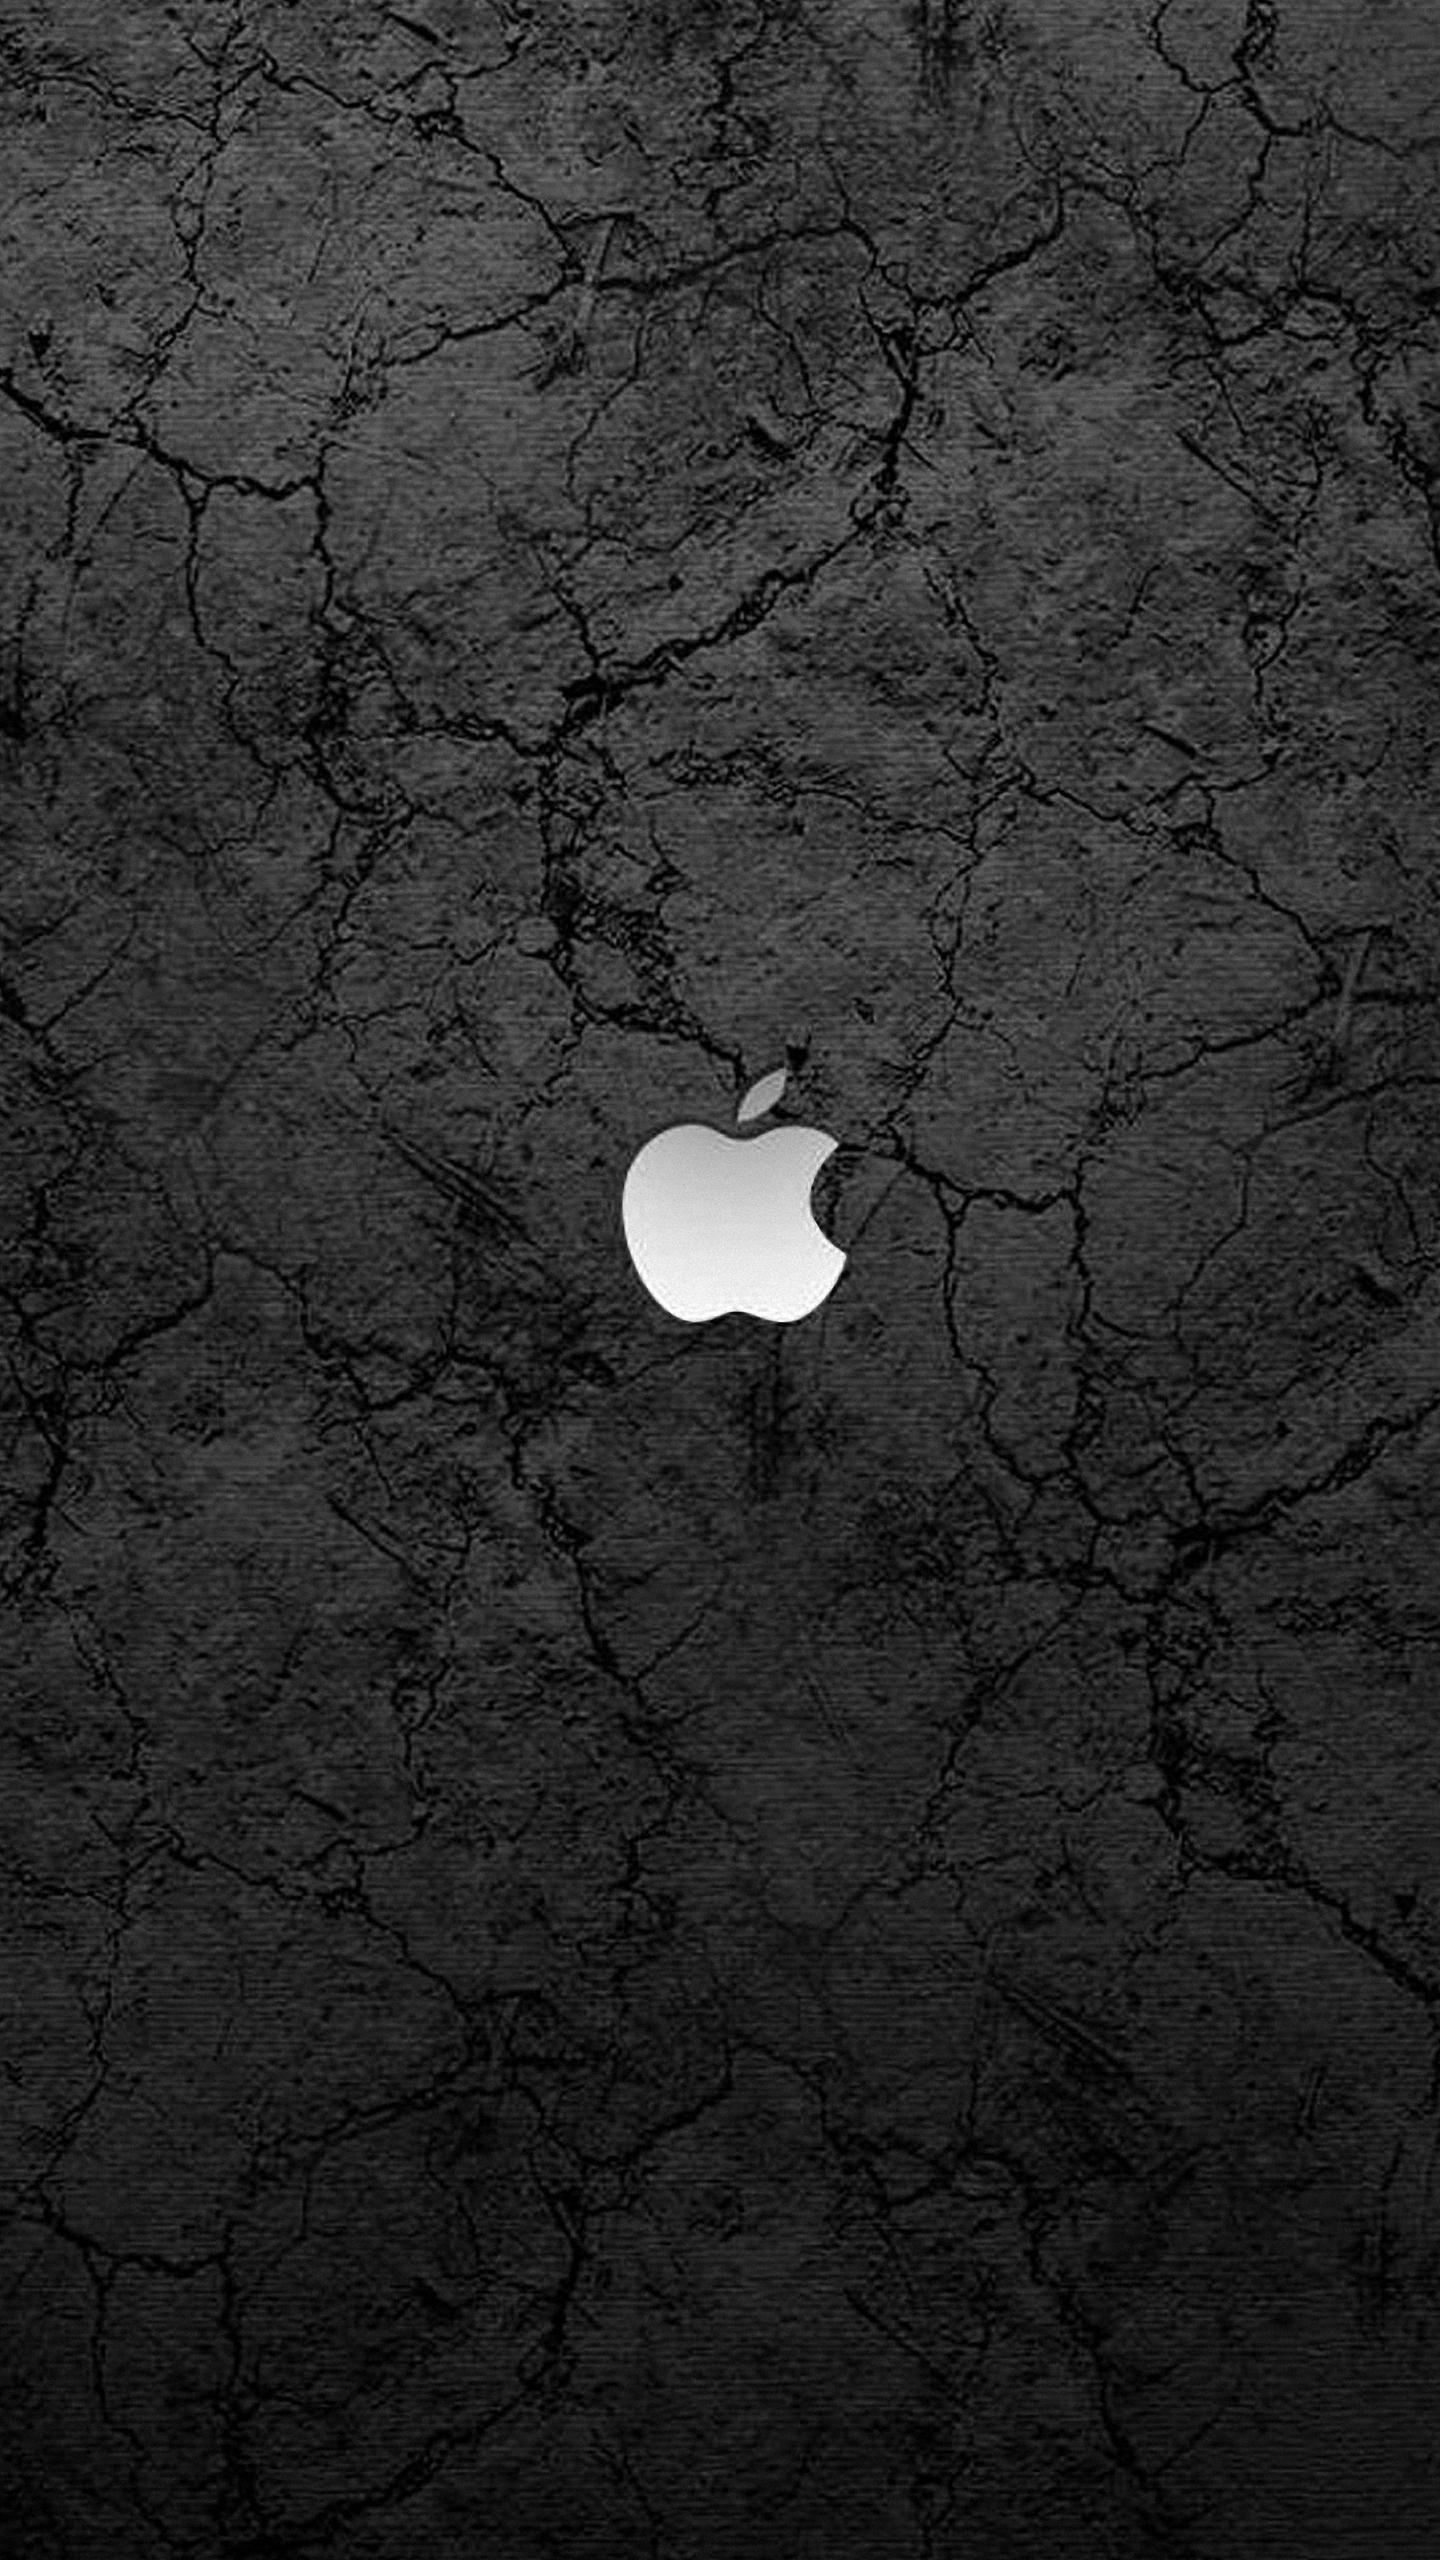 4k Wallpaper Iphone Dark 3d Wallpapers Apple Wallpaper Iphone Black And White Wallpaper Iphone Black Apple Wallpaper